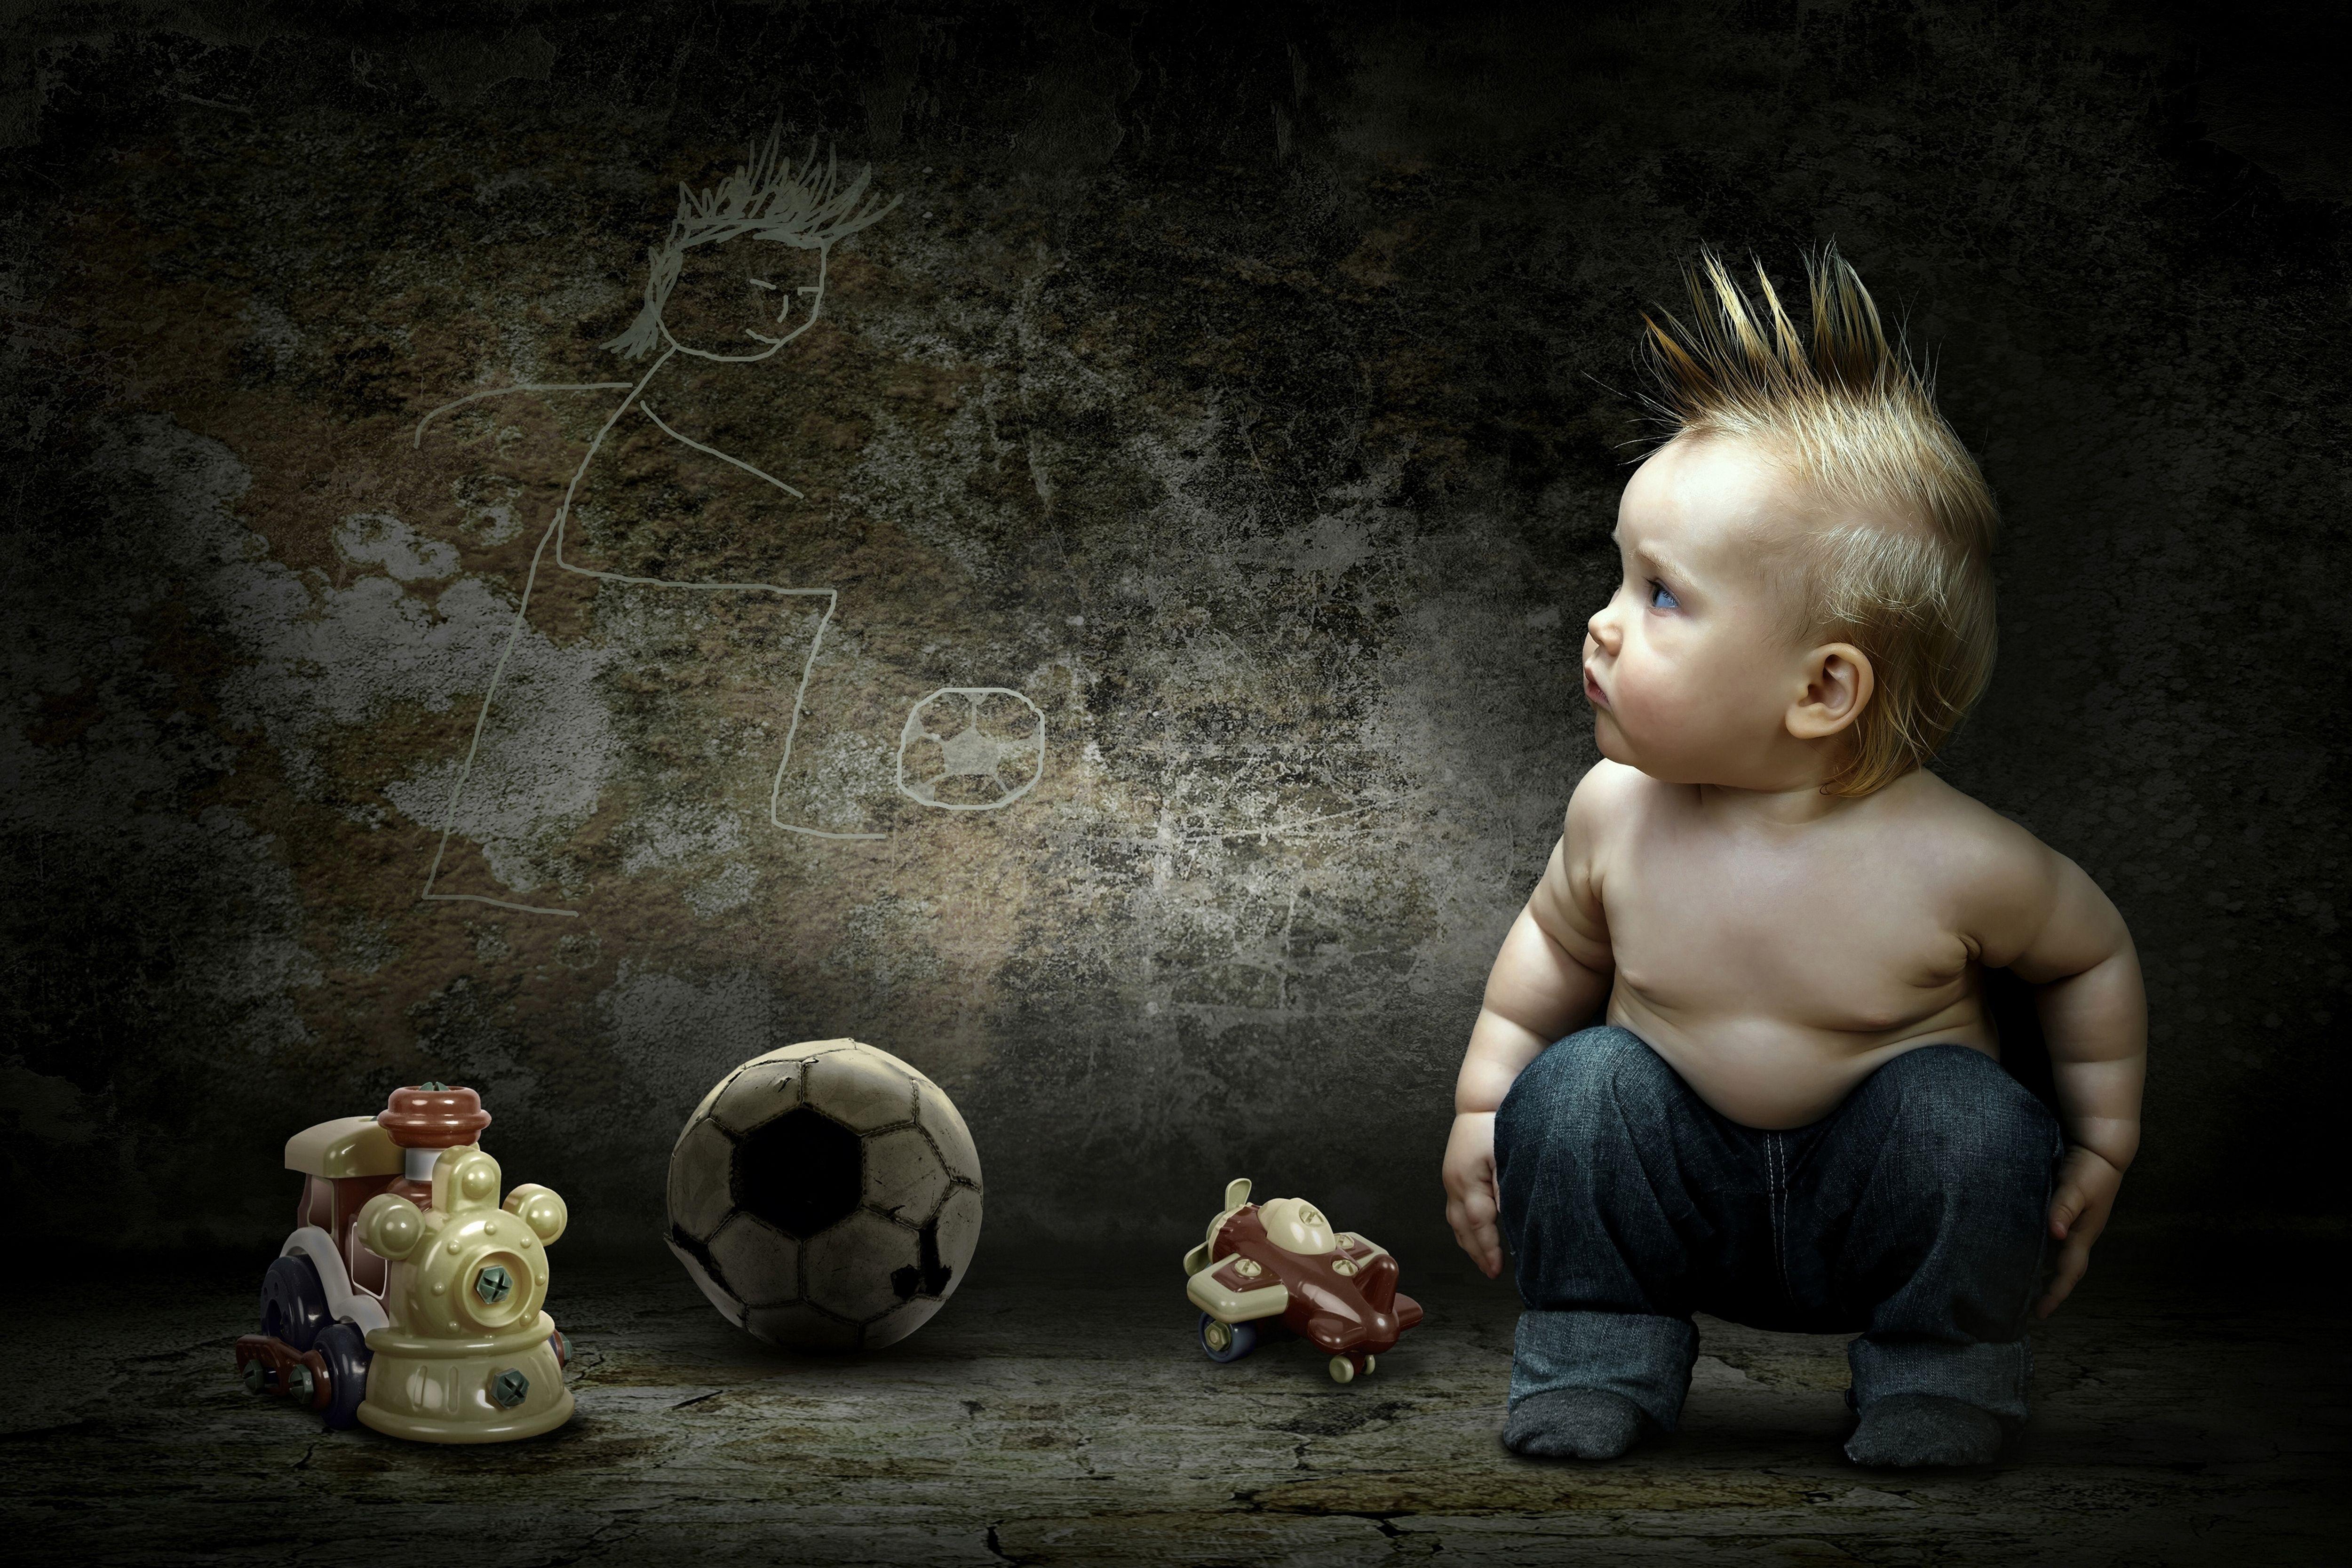 Fond D Ecran Garcon Enfant Mur Photo Jouets Ballon 5000x3333 1012079 Fond D Ecran Wallhere